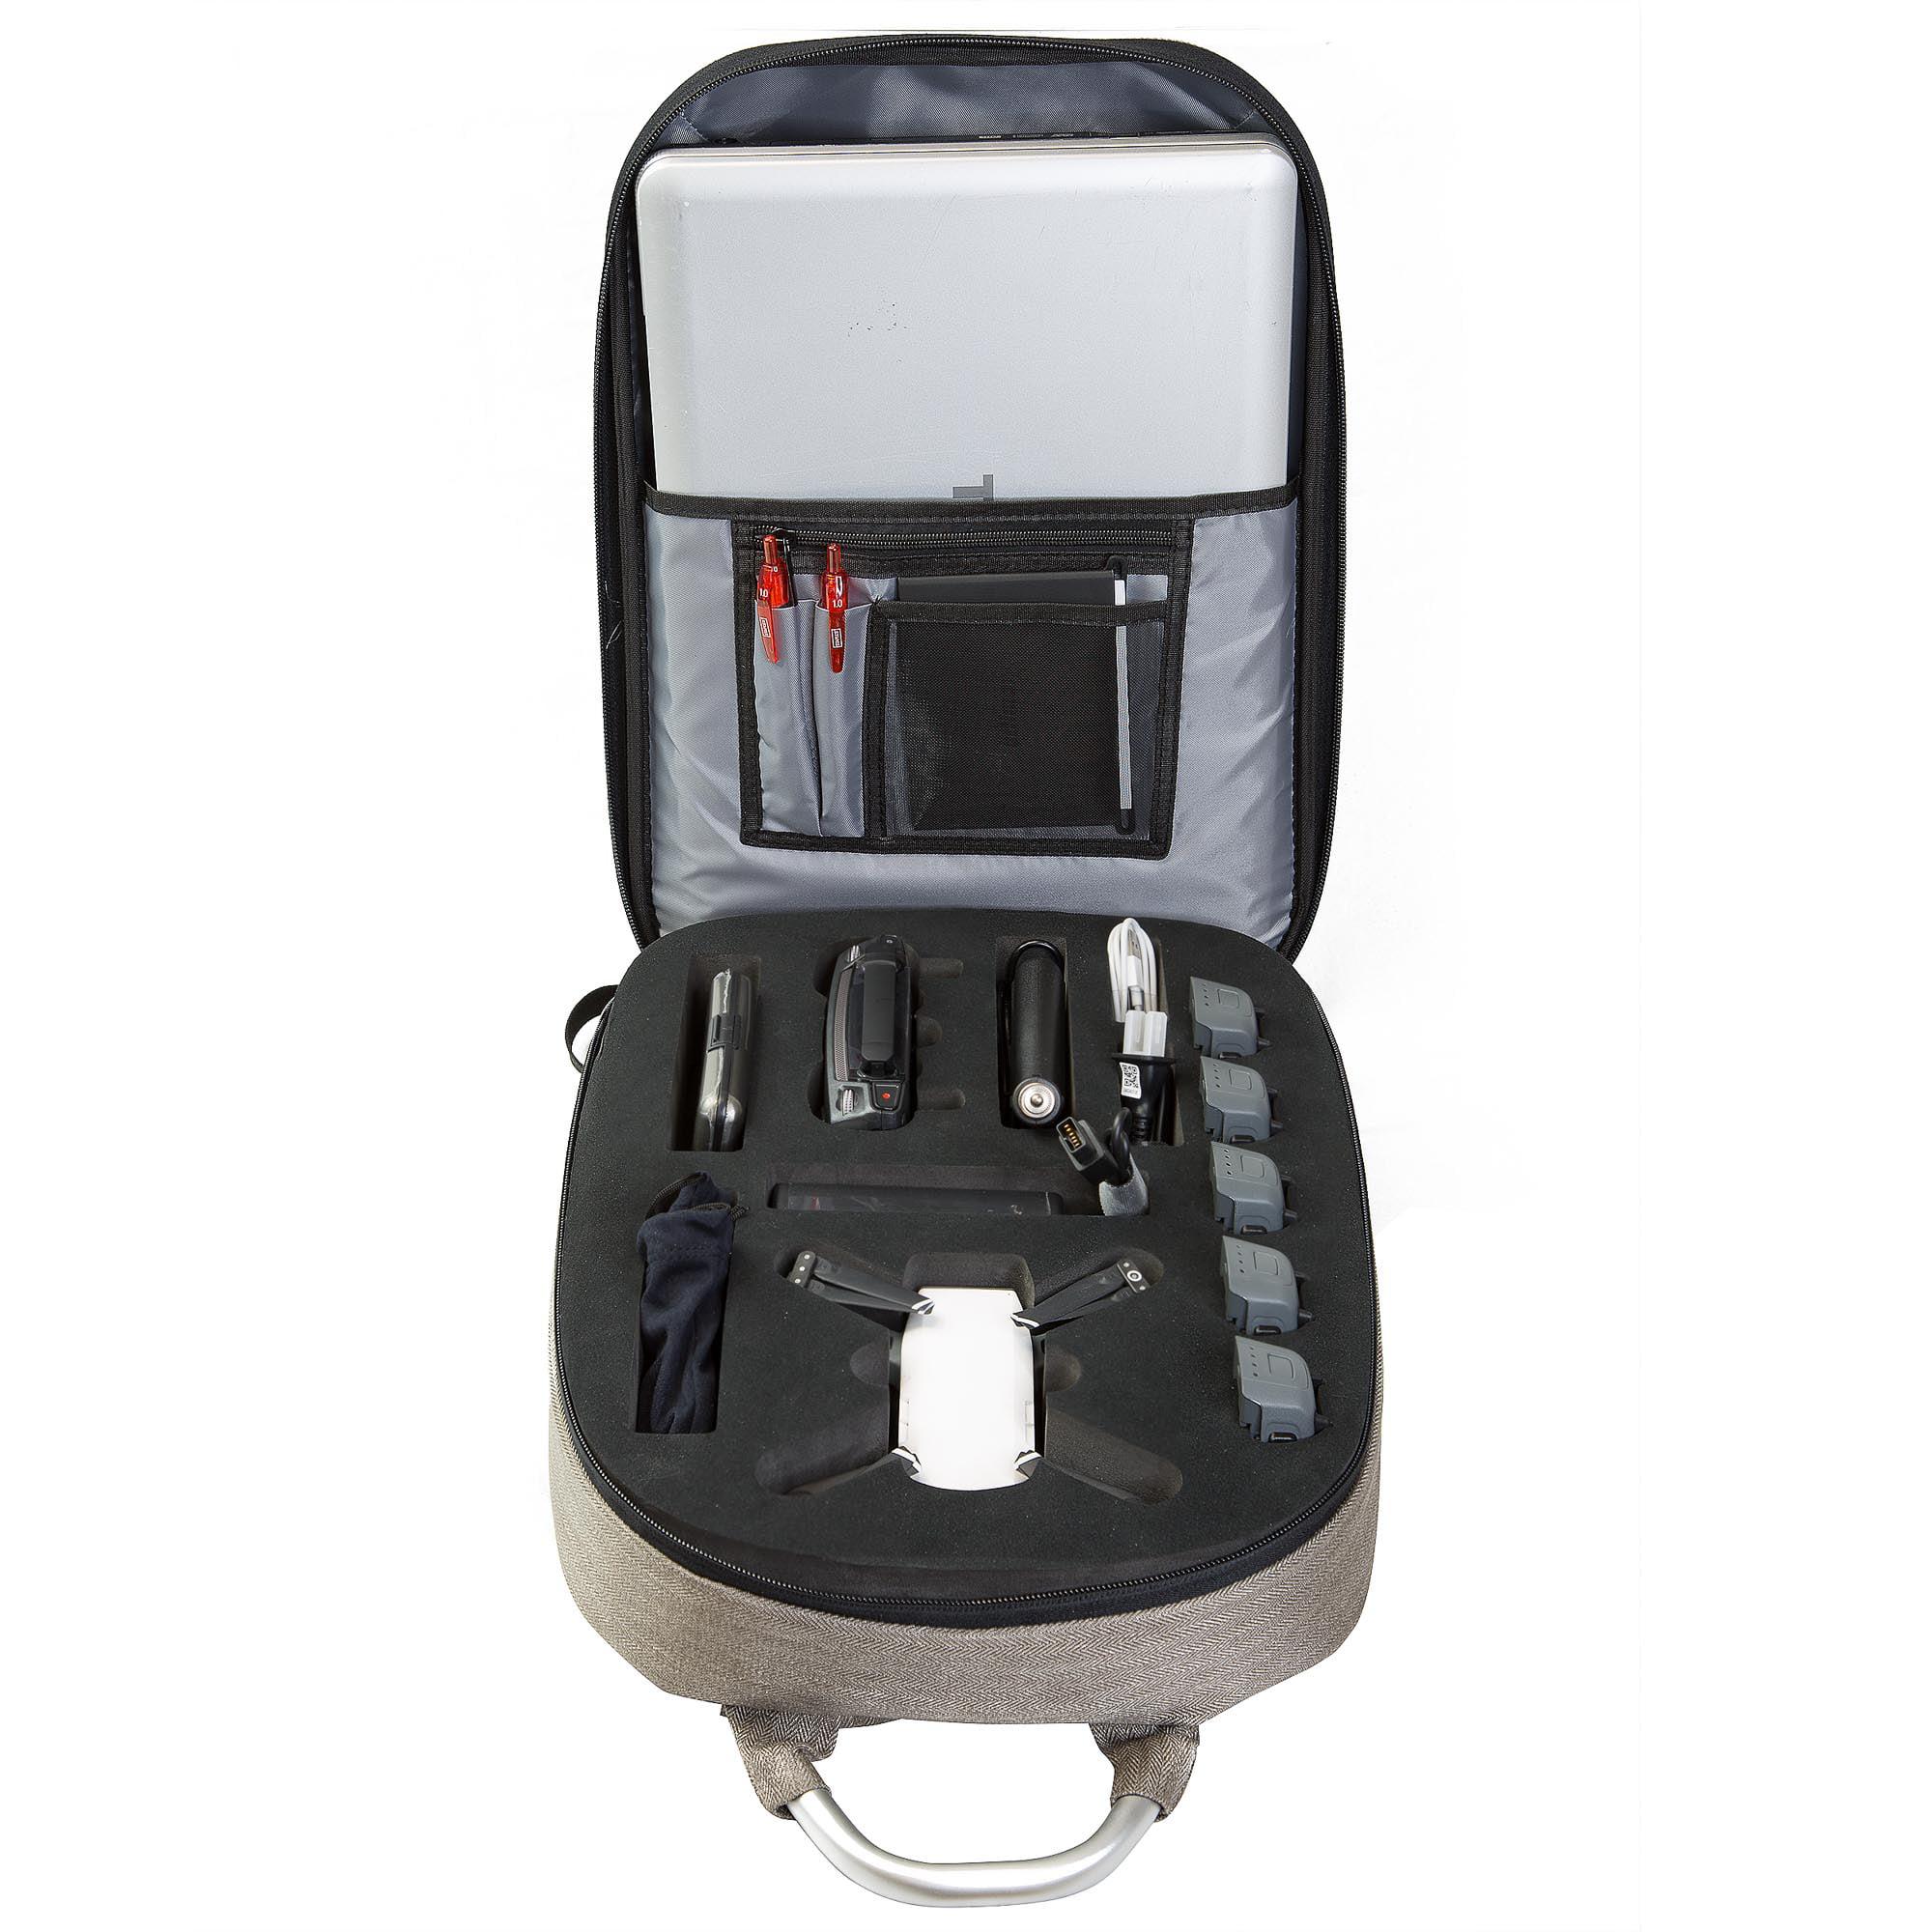 Ultimaxx Hard Shell Anti-choc Sac à dos Voyage Case pour DJI Spark Quadcopter Drones - image 1 de 7